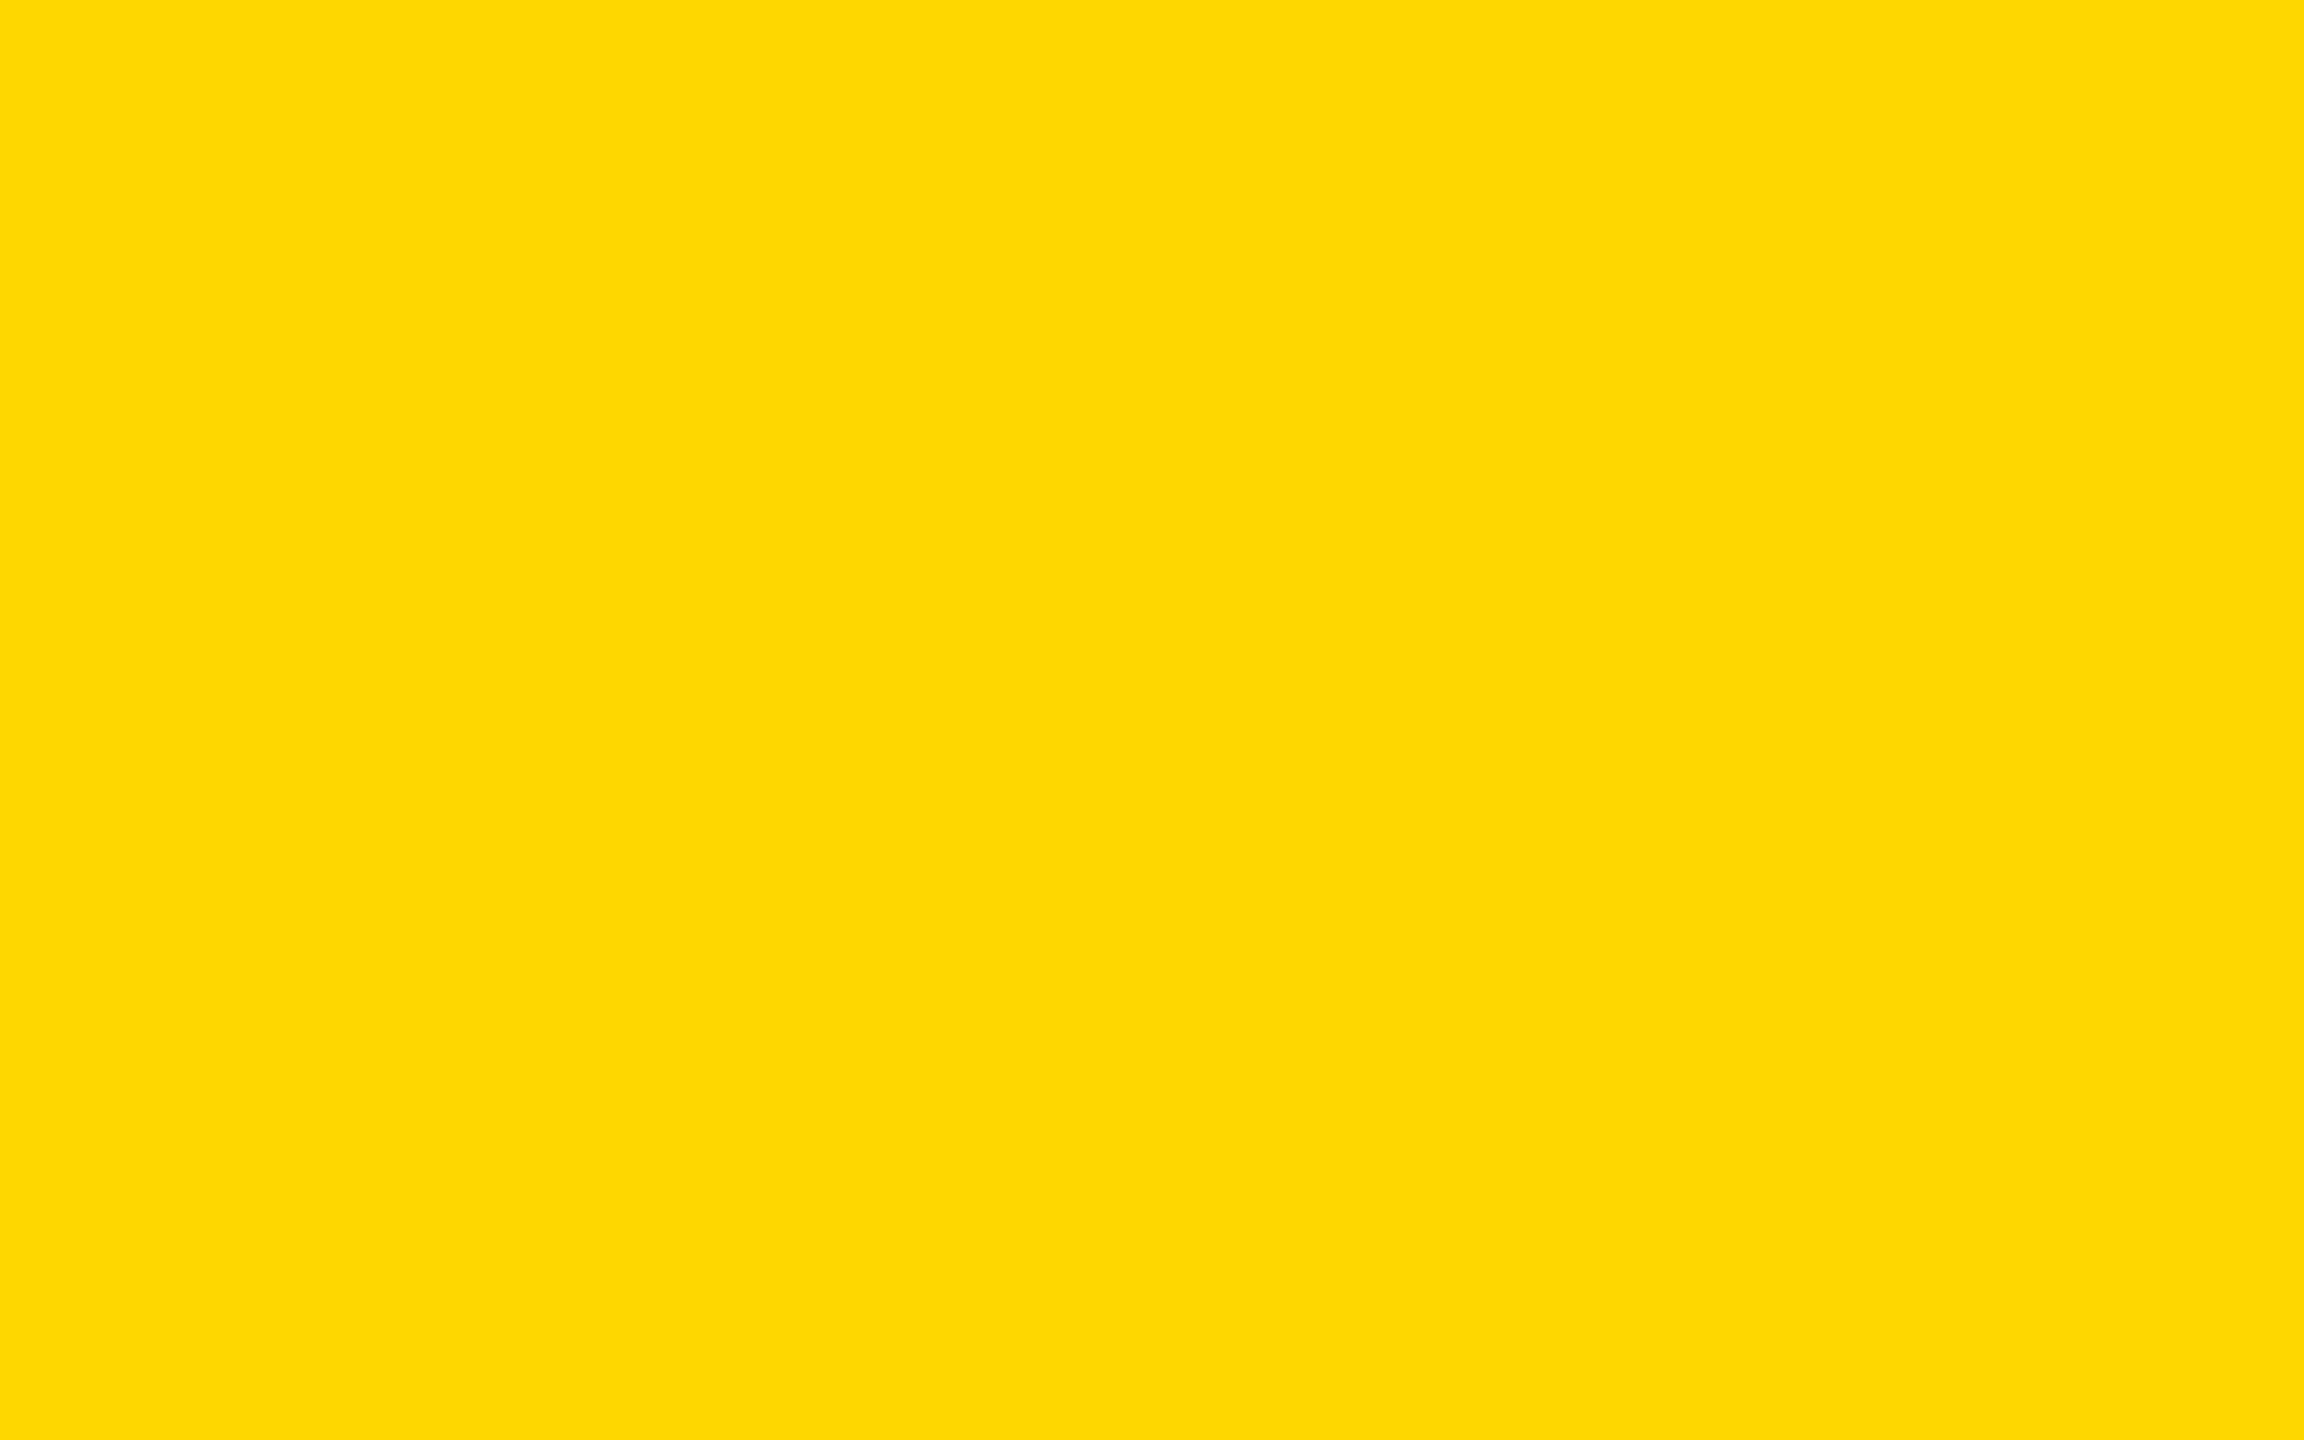 2304x1440 Gold Web Golden Solid Color Background